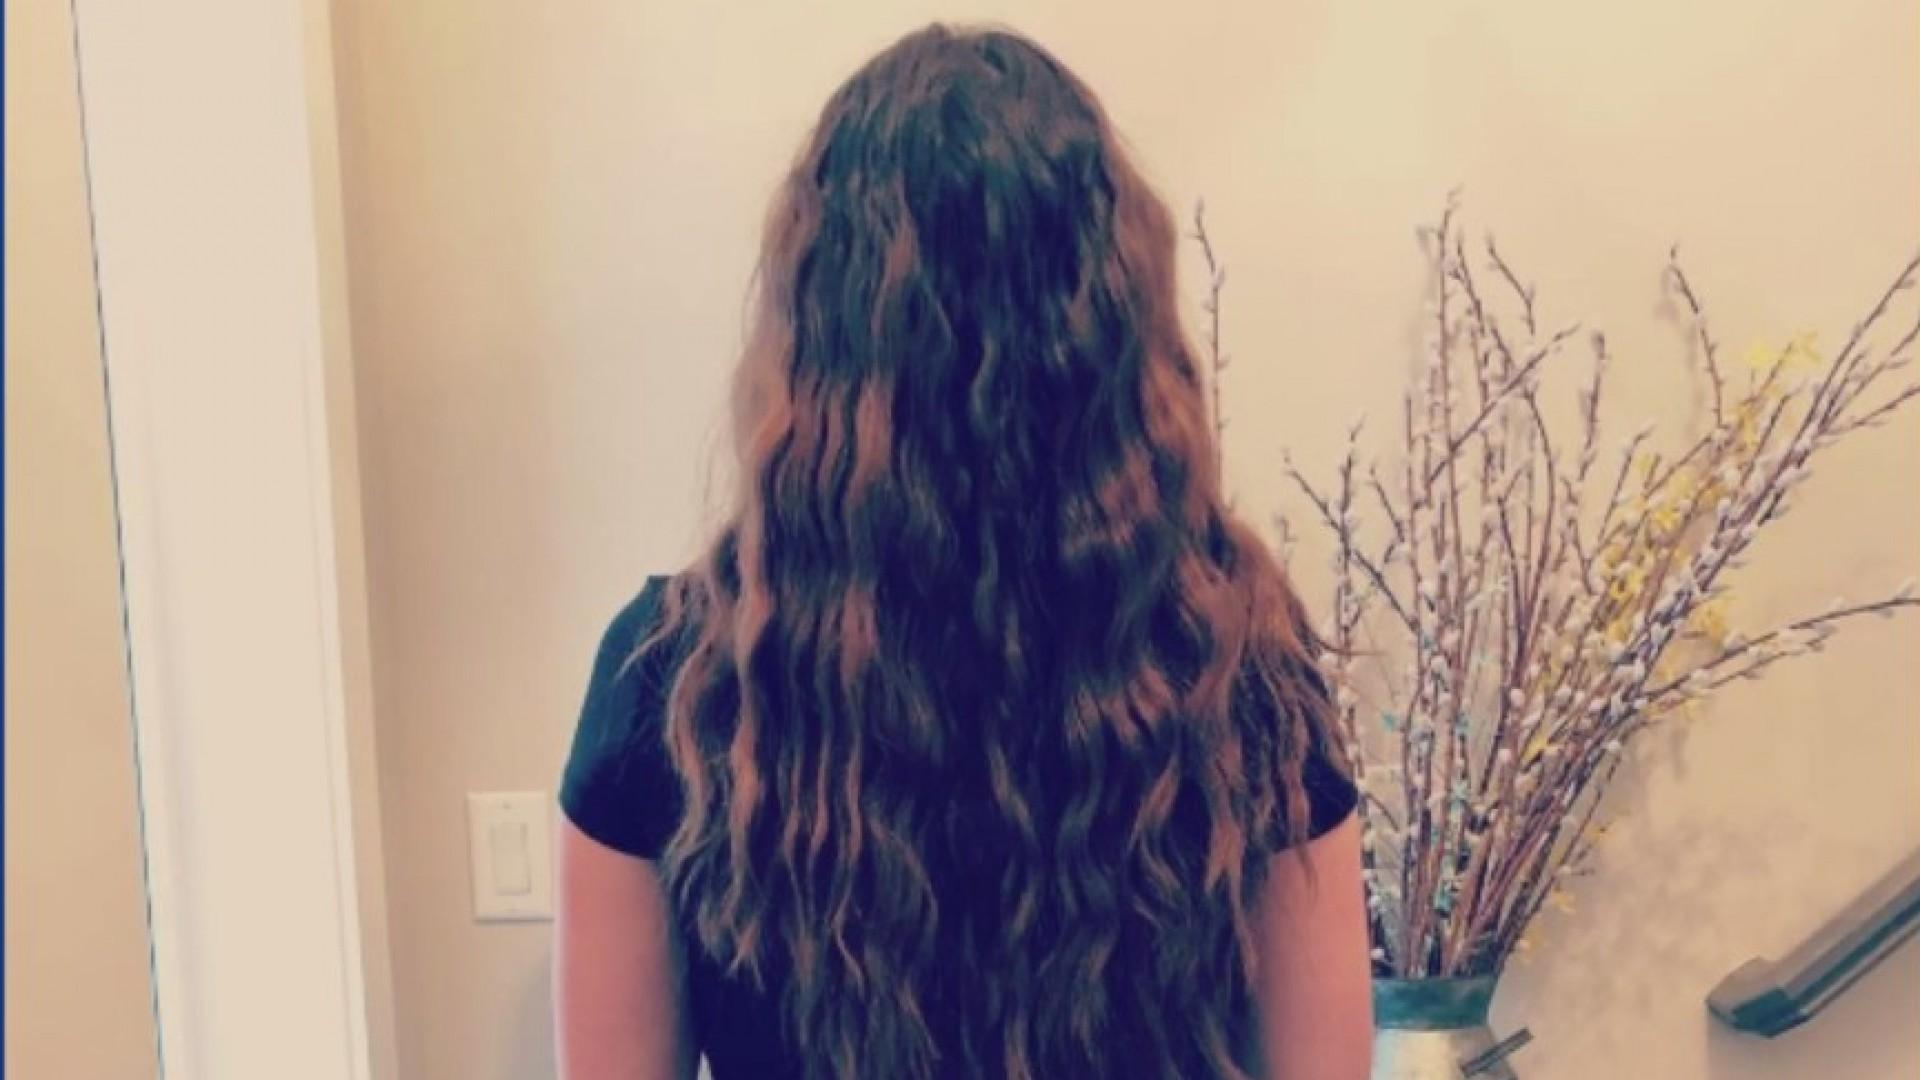 Woman_saves_long_locks_of_hair_during_ch_0_20190105025653